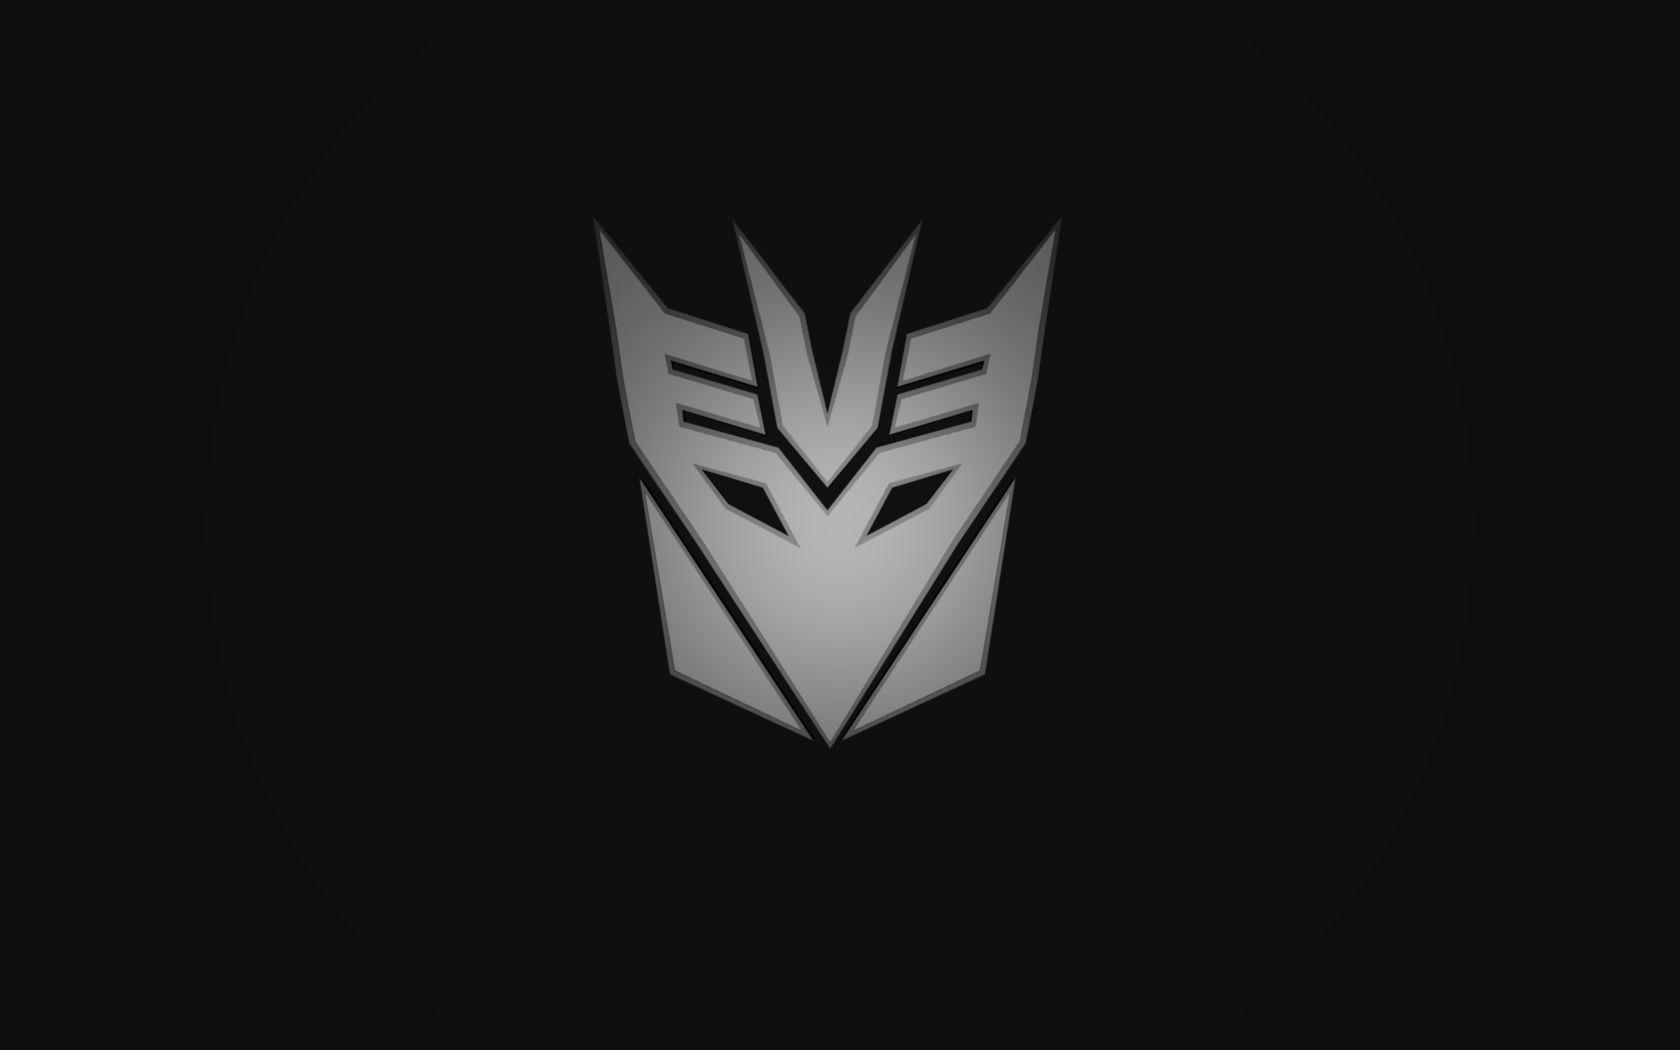 Decepticon Wallpapers - Wallpaper Cave